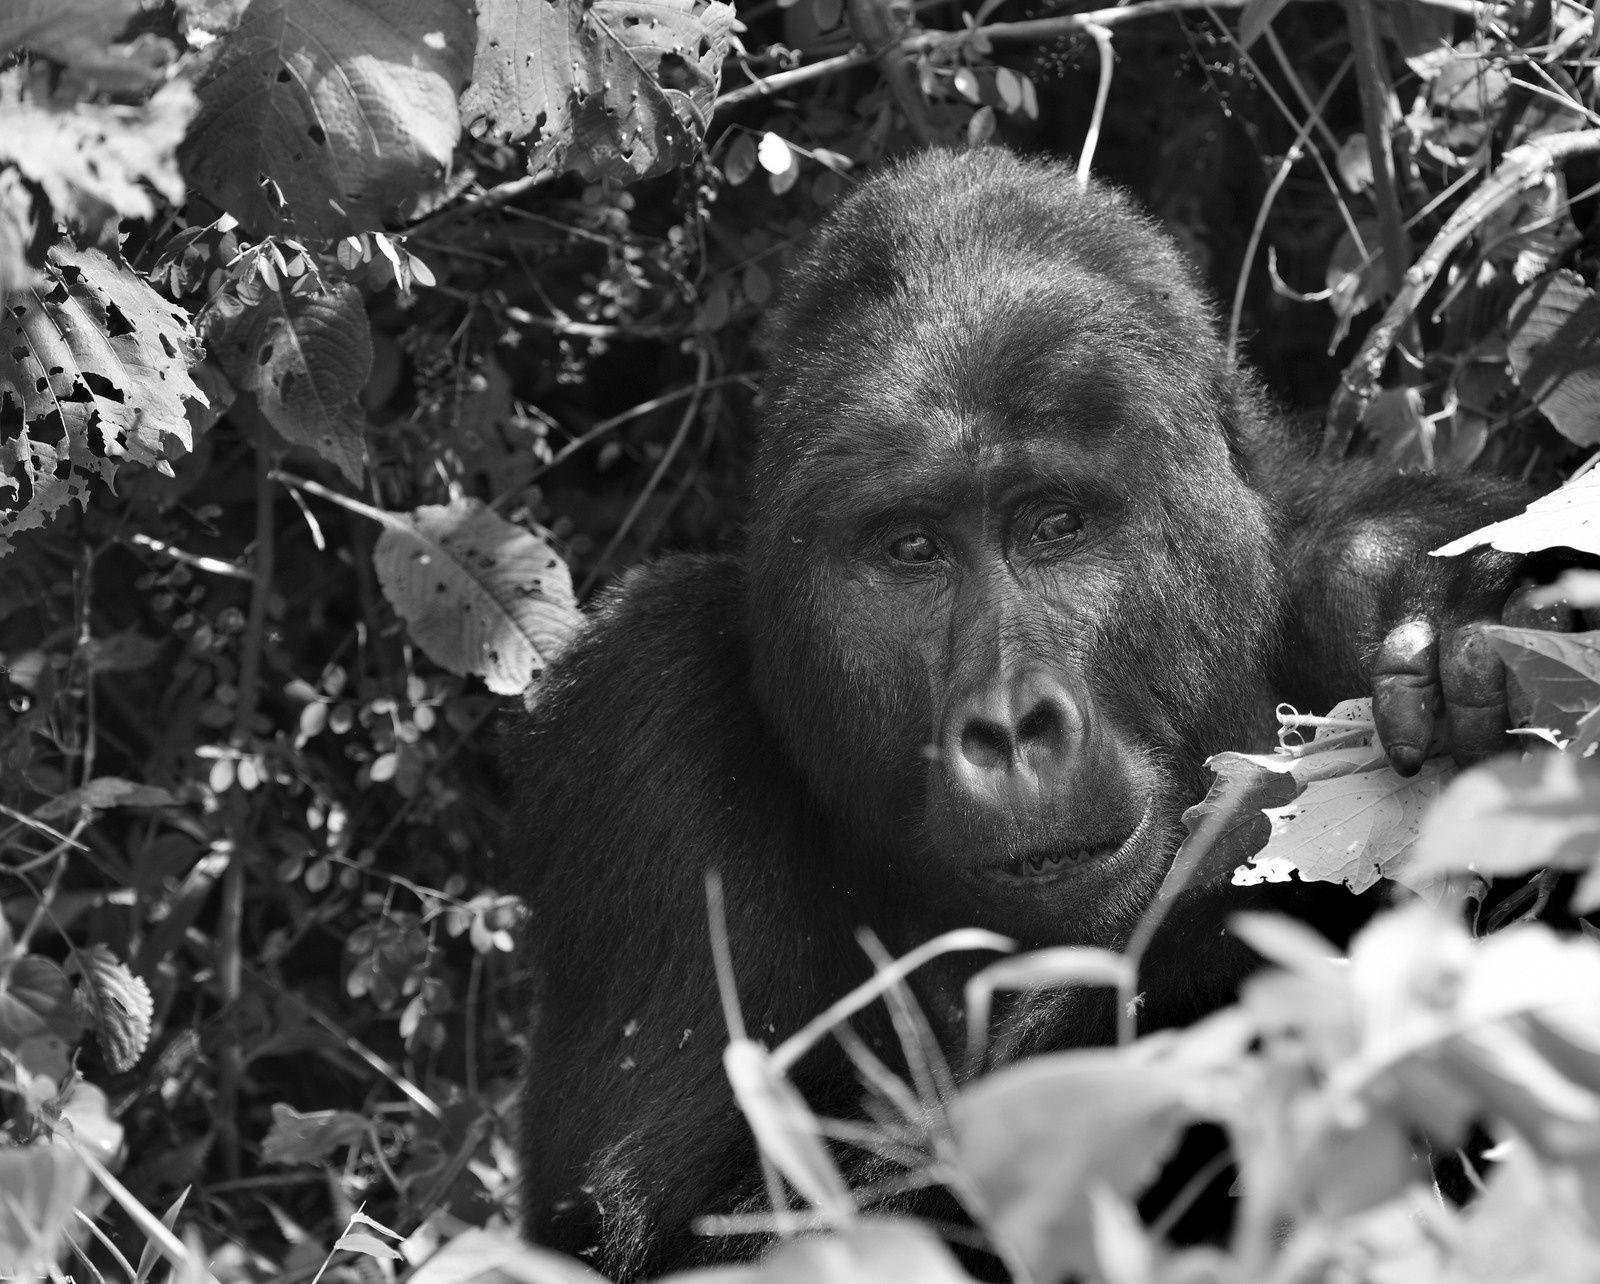 tracking the gorilla in ouganda - by albi